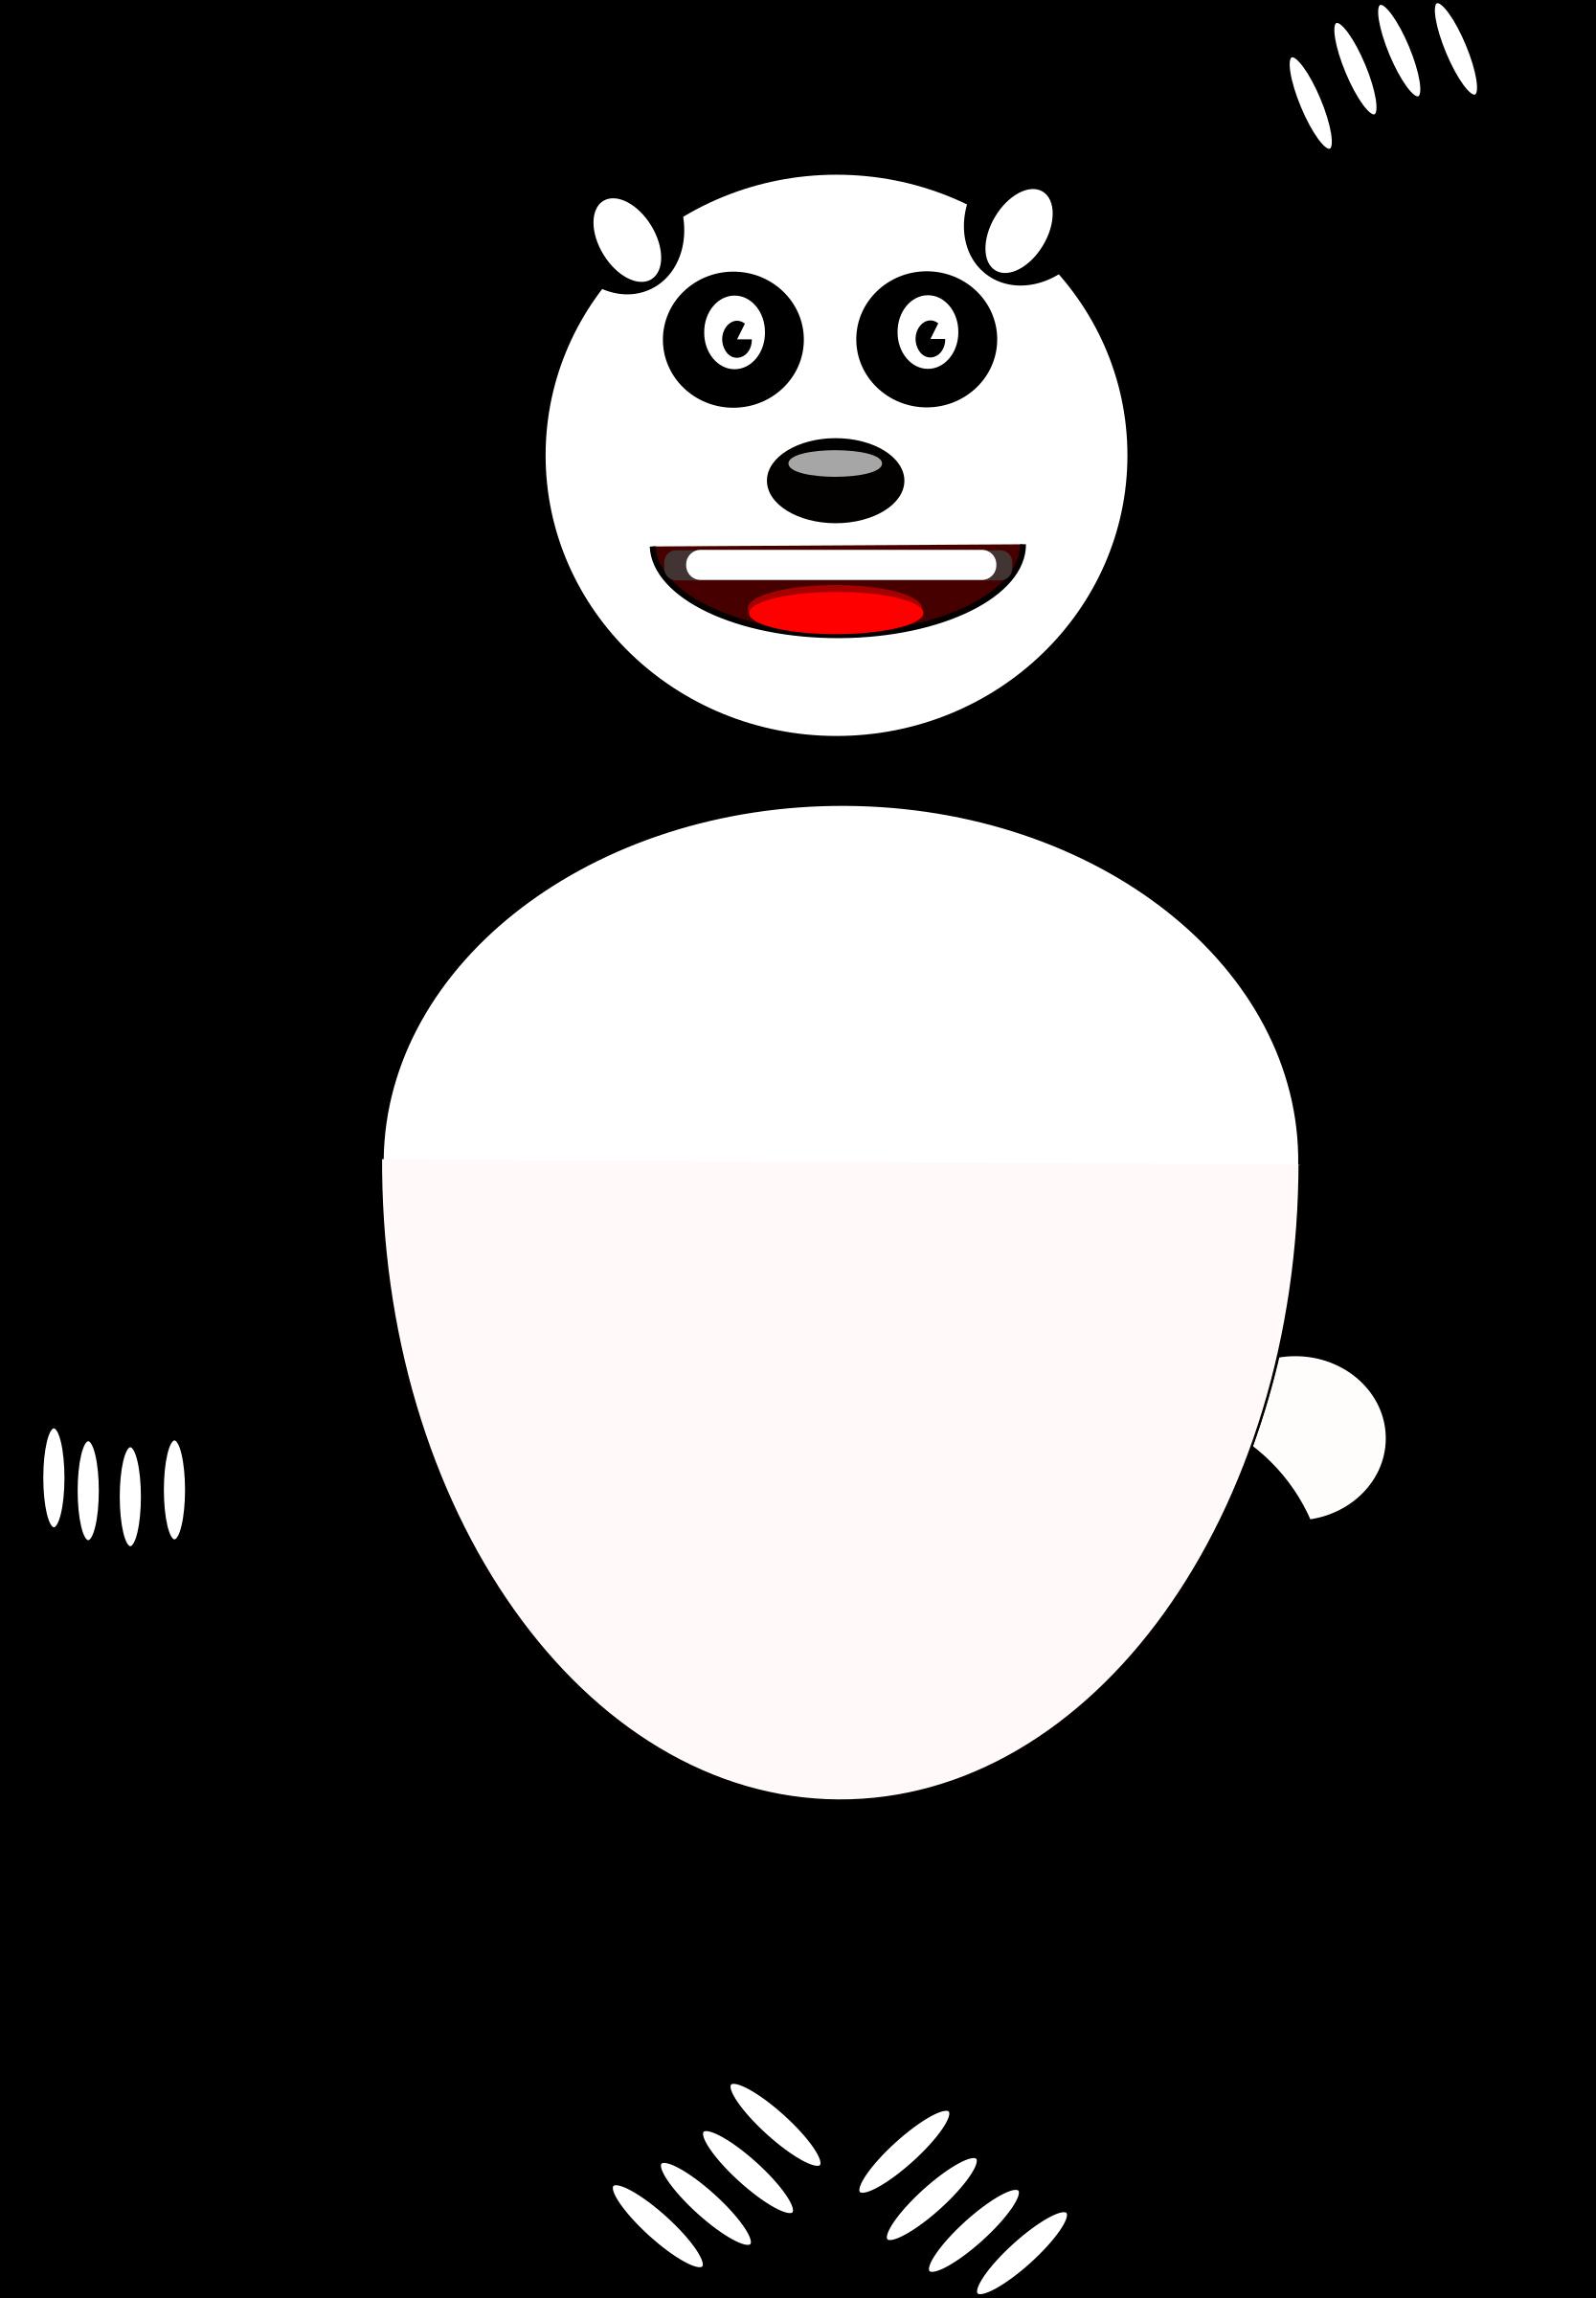 Comic big image png. Panda clipart royalty free